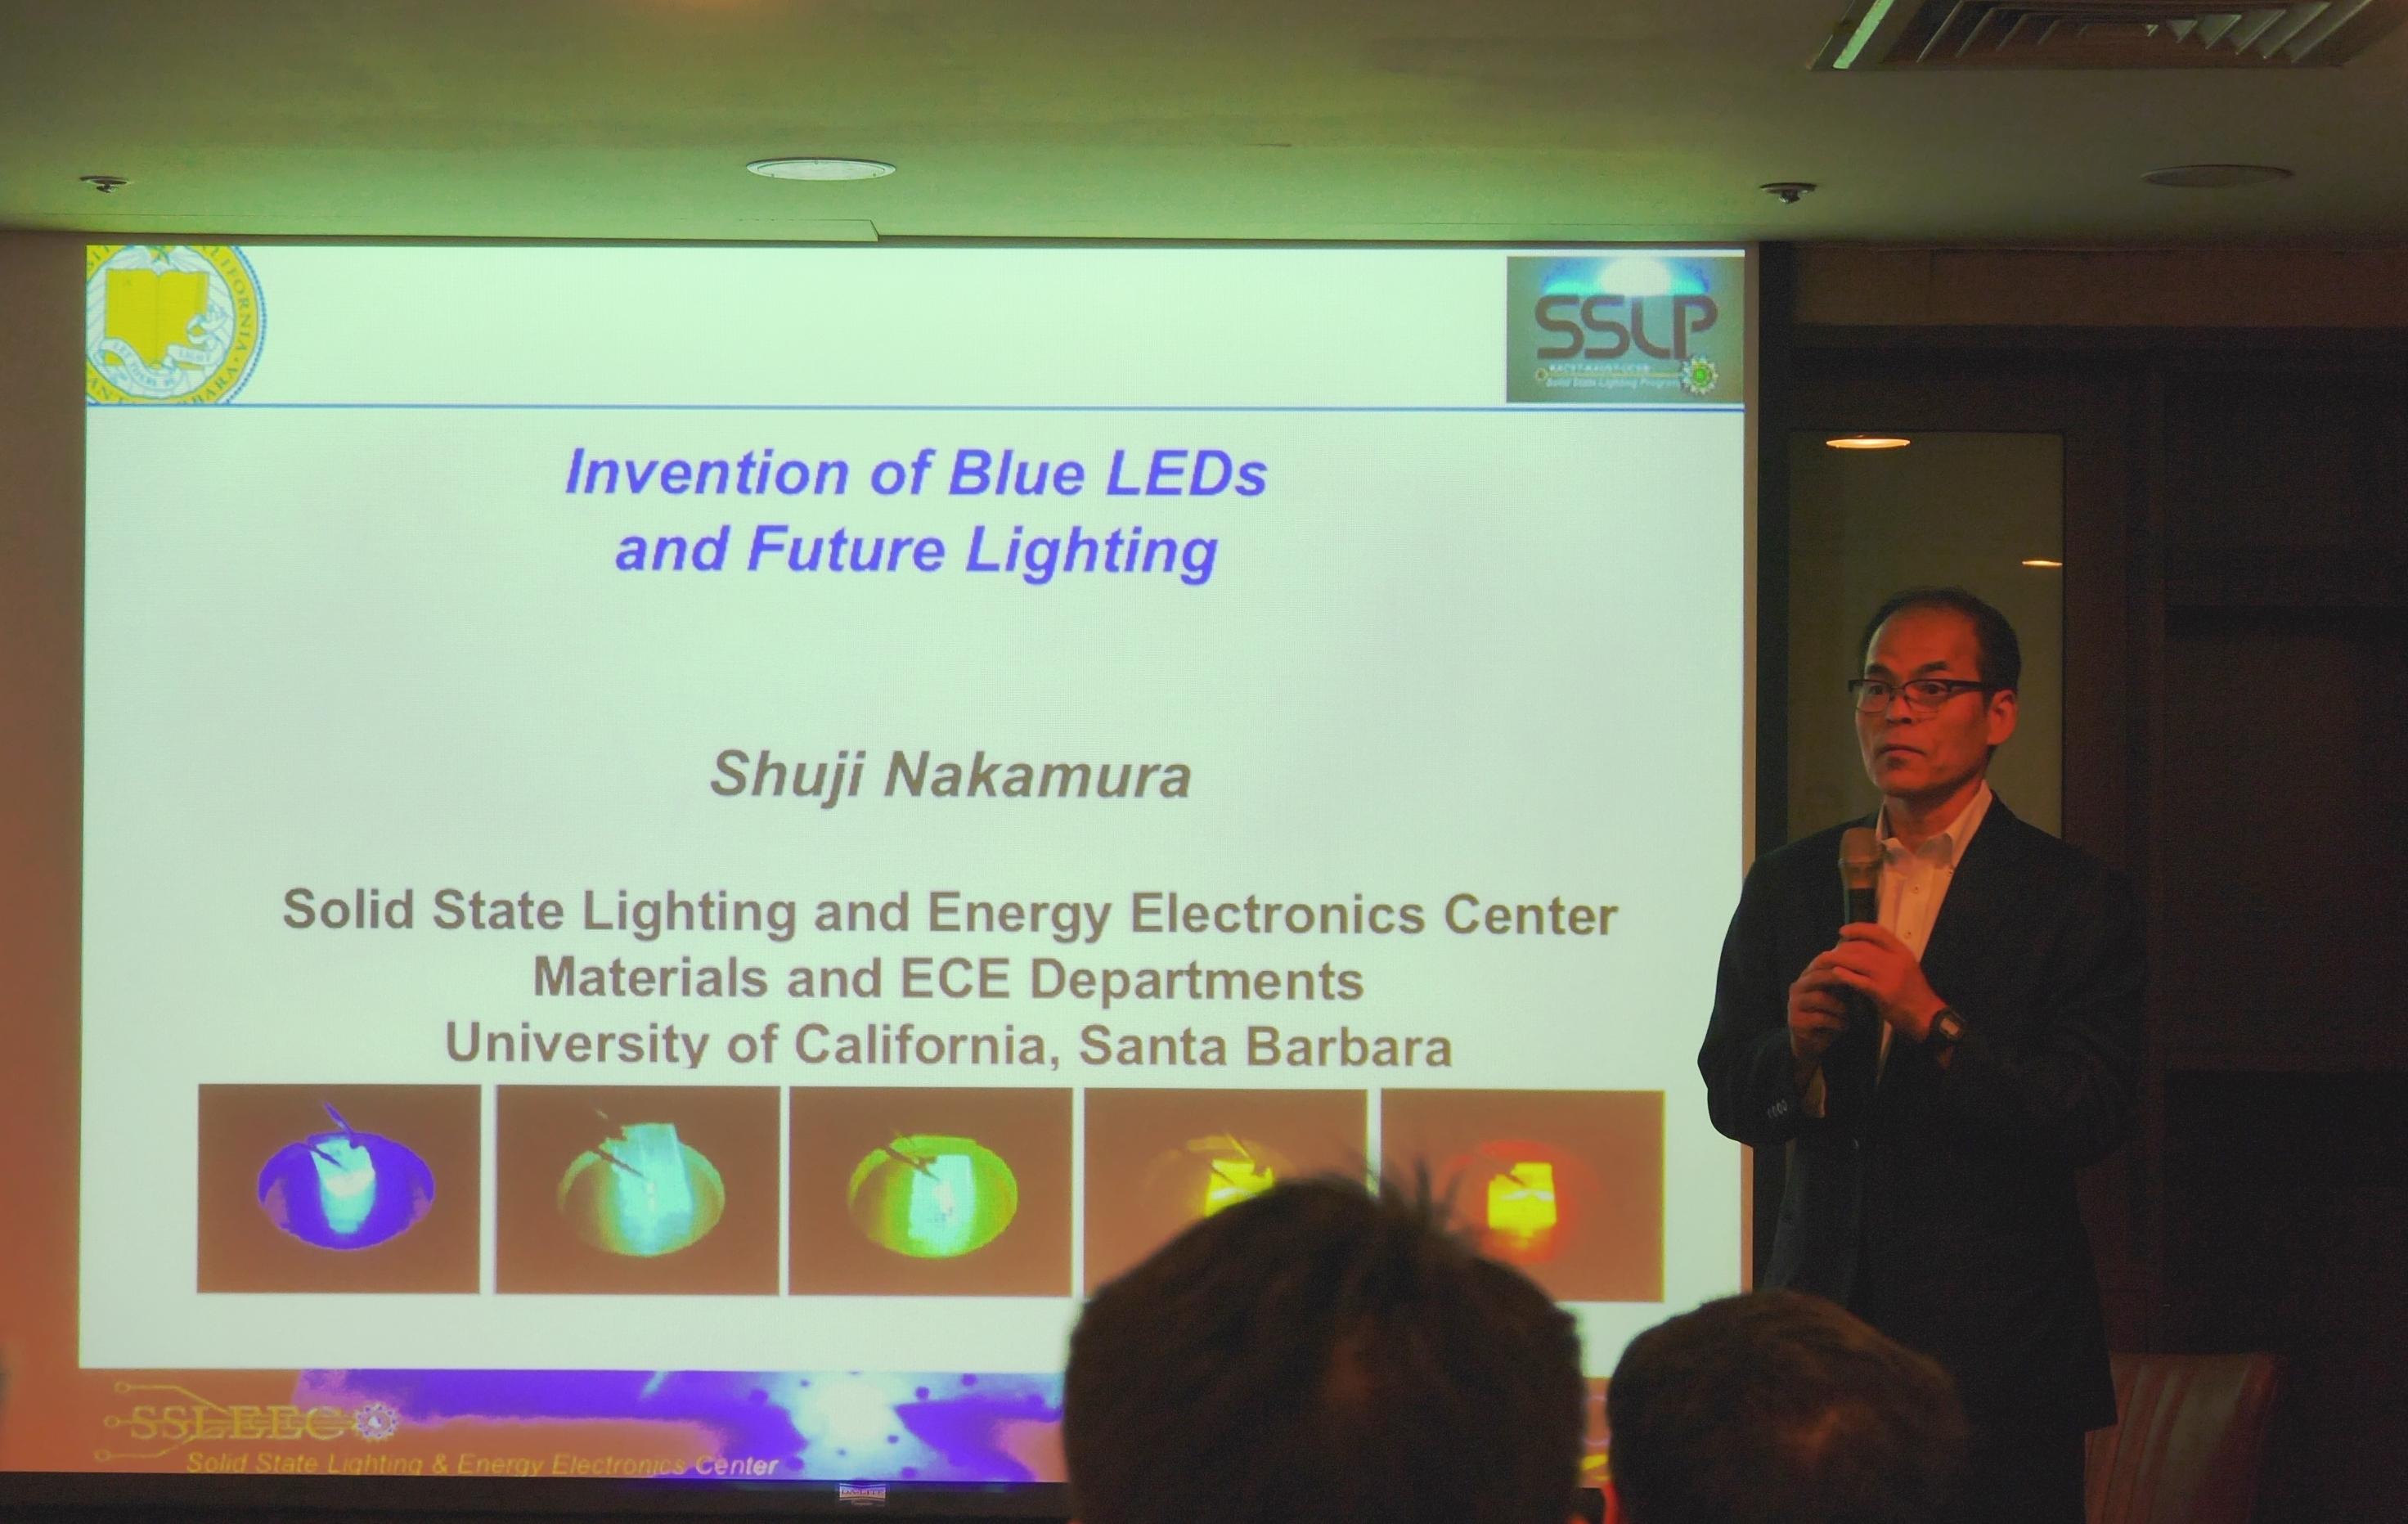 Nobel Laureate Shuiji Nakamura Sees Laser Lighting and Li-Fi the Next Target for LEDs